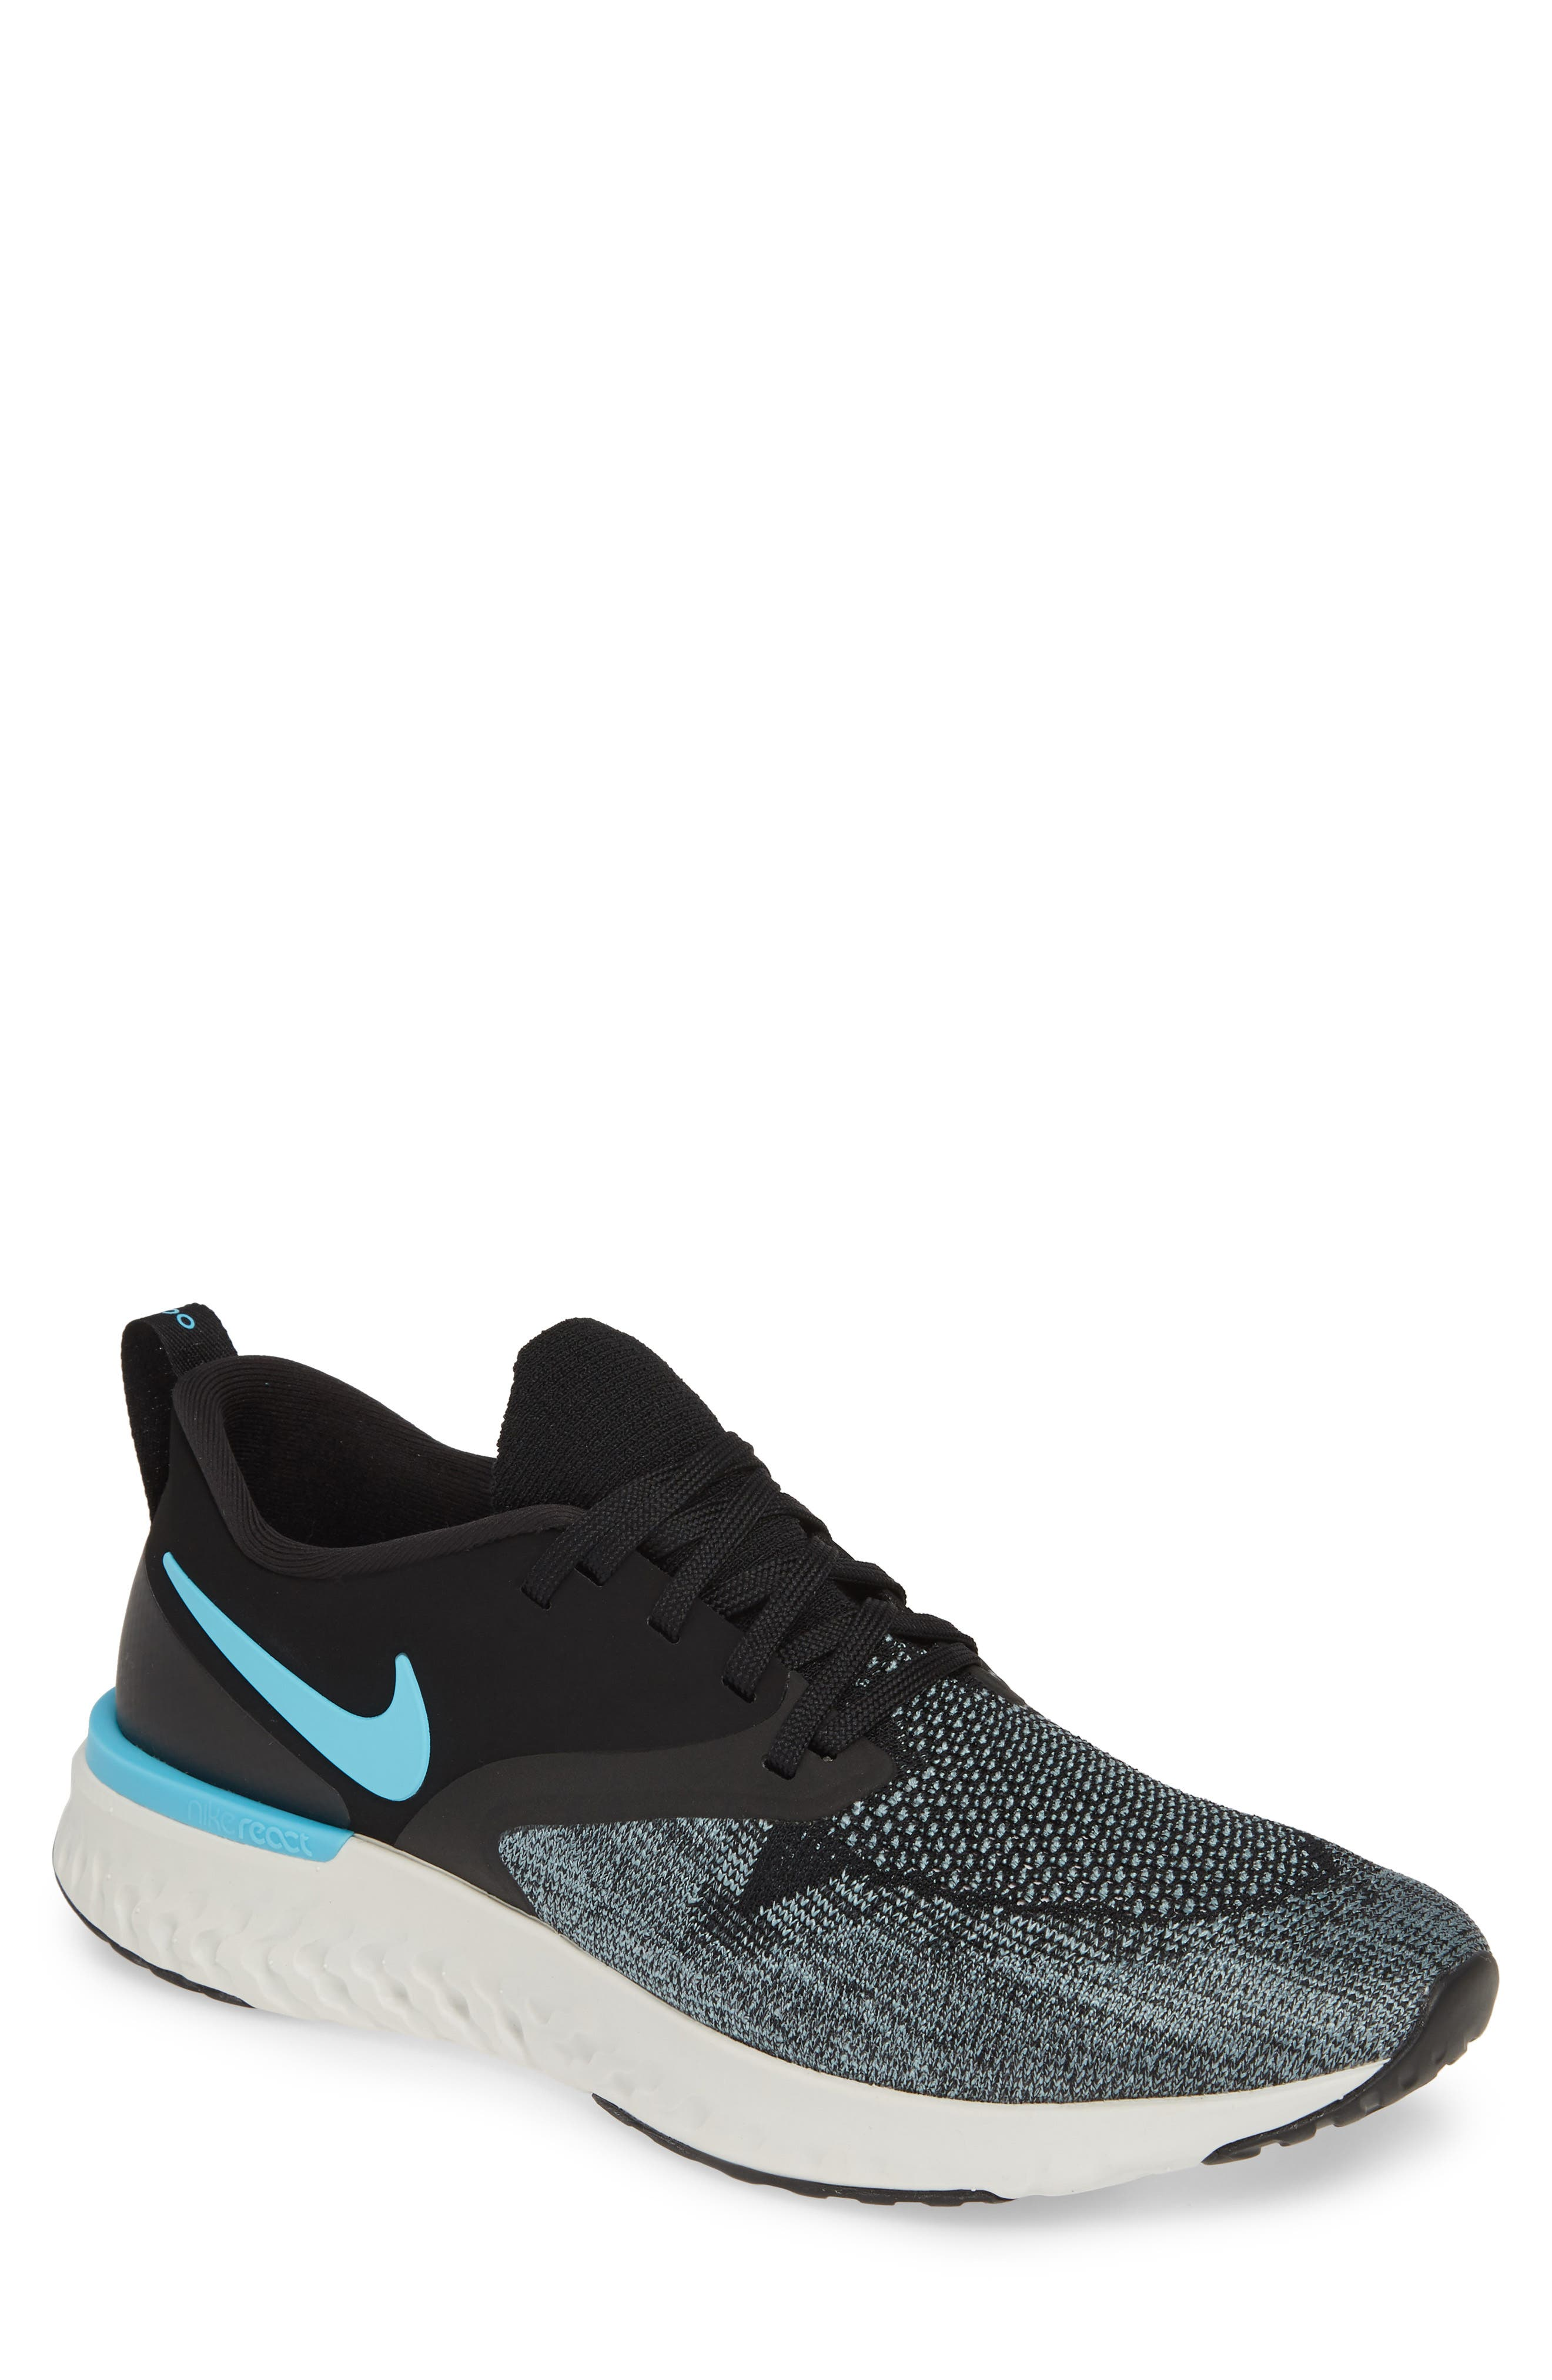 NIKE Odyssey React 2 Flyknit Running Shoe, Main, color, BLACK/ BLUE FURY/ AVIATOR GREY